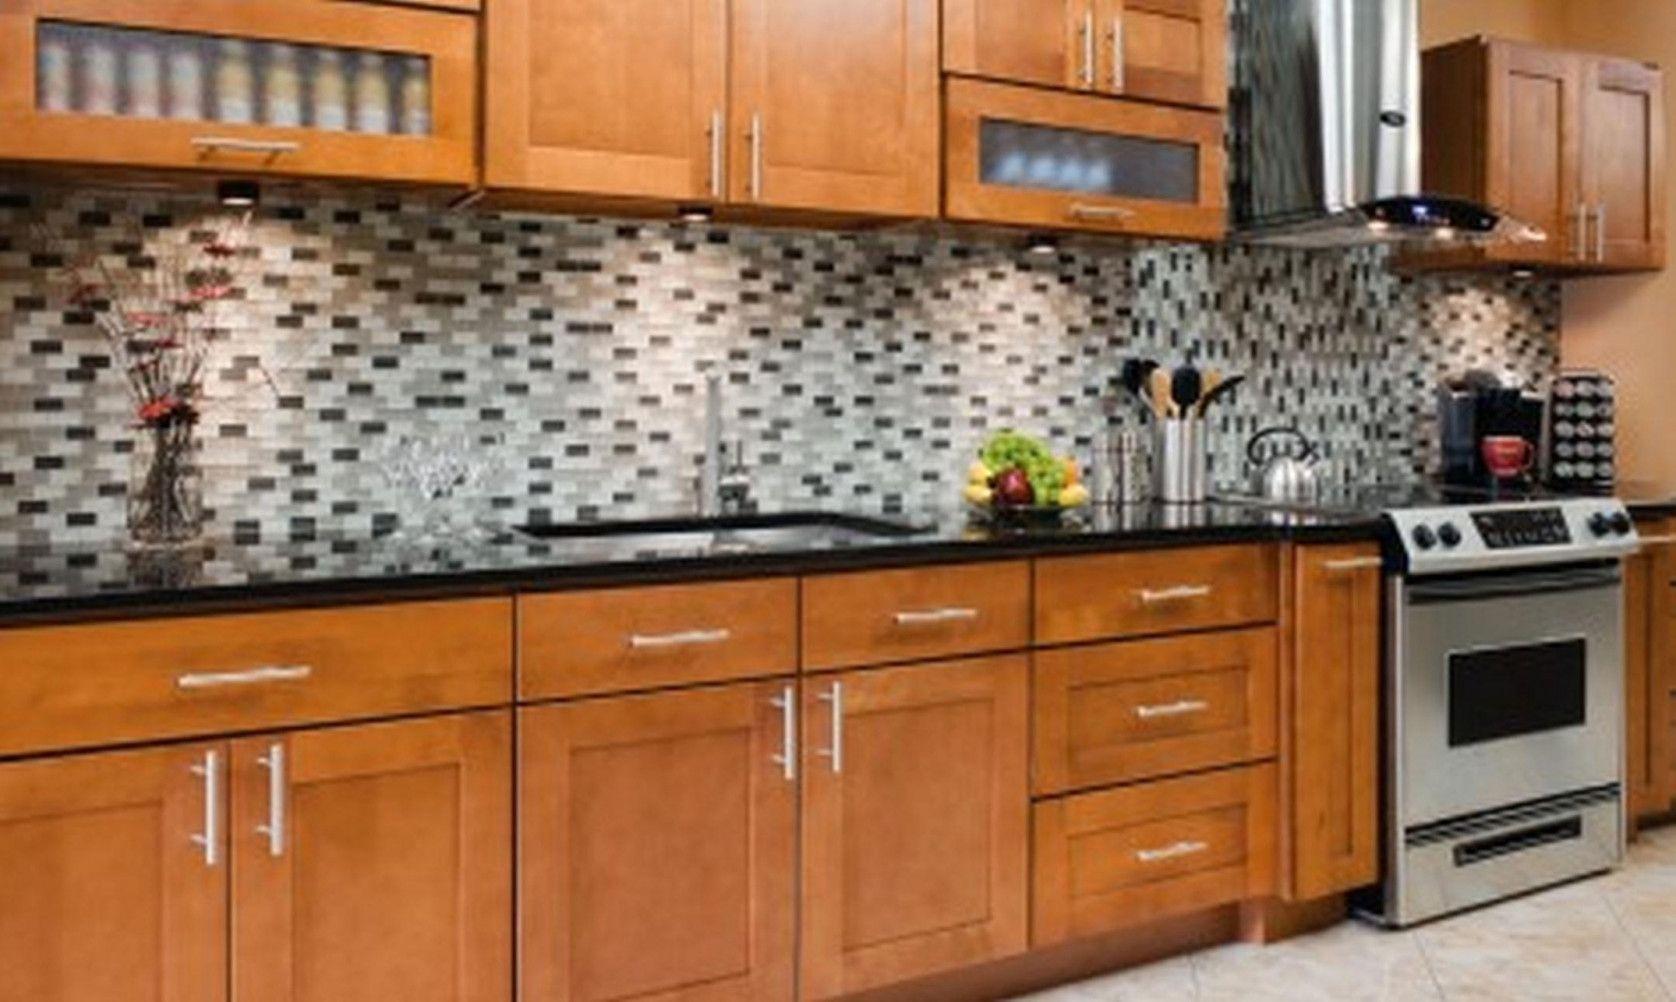 99+ Buy Cabinet Hardware Online - Kitchen Cabinet Lighting Ideas ...